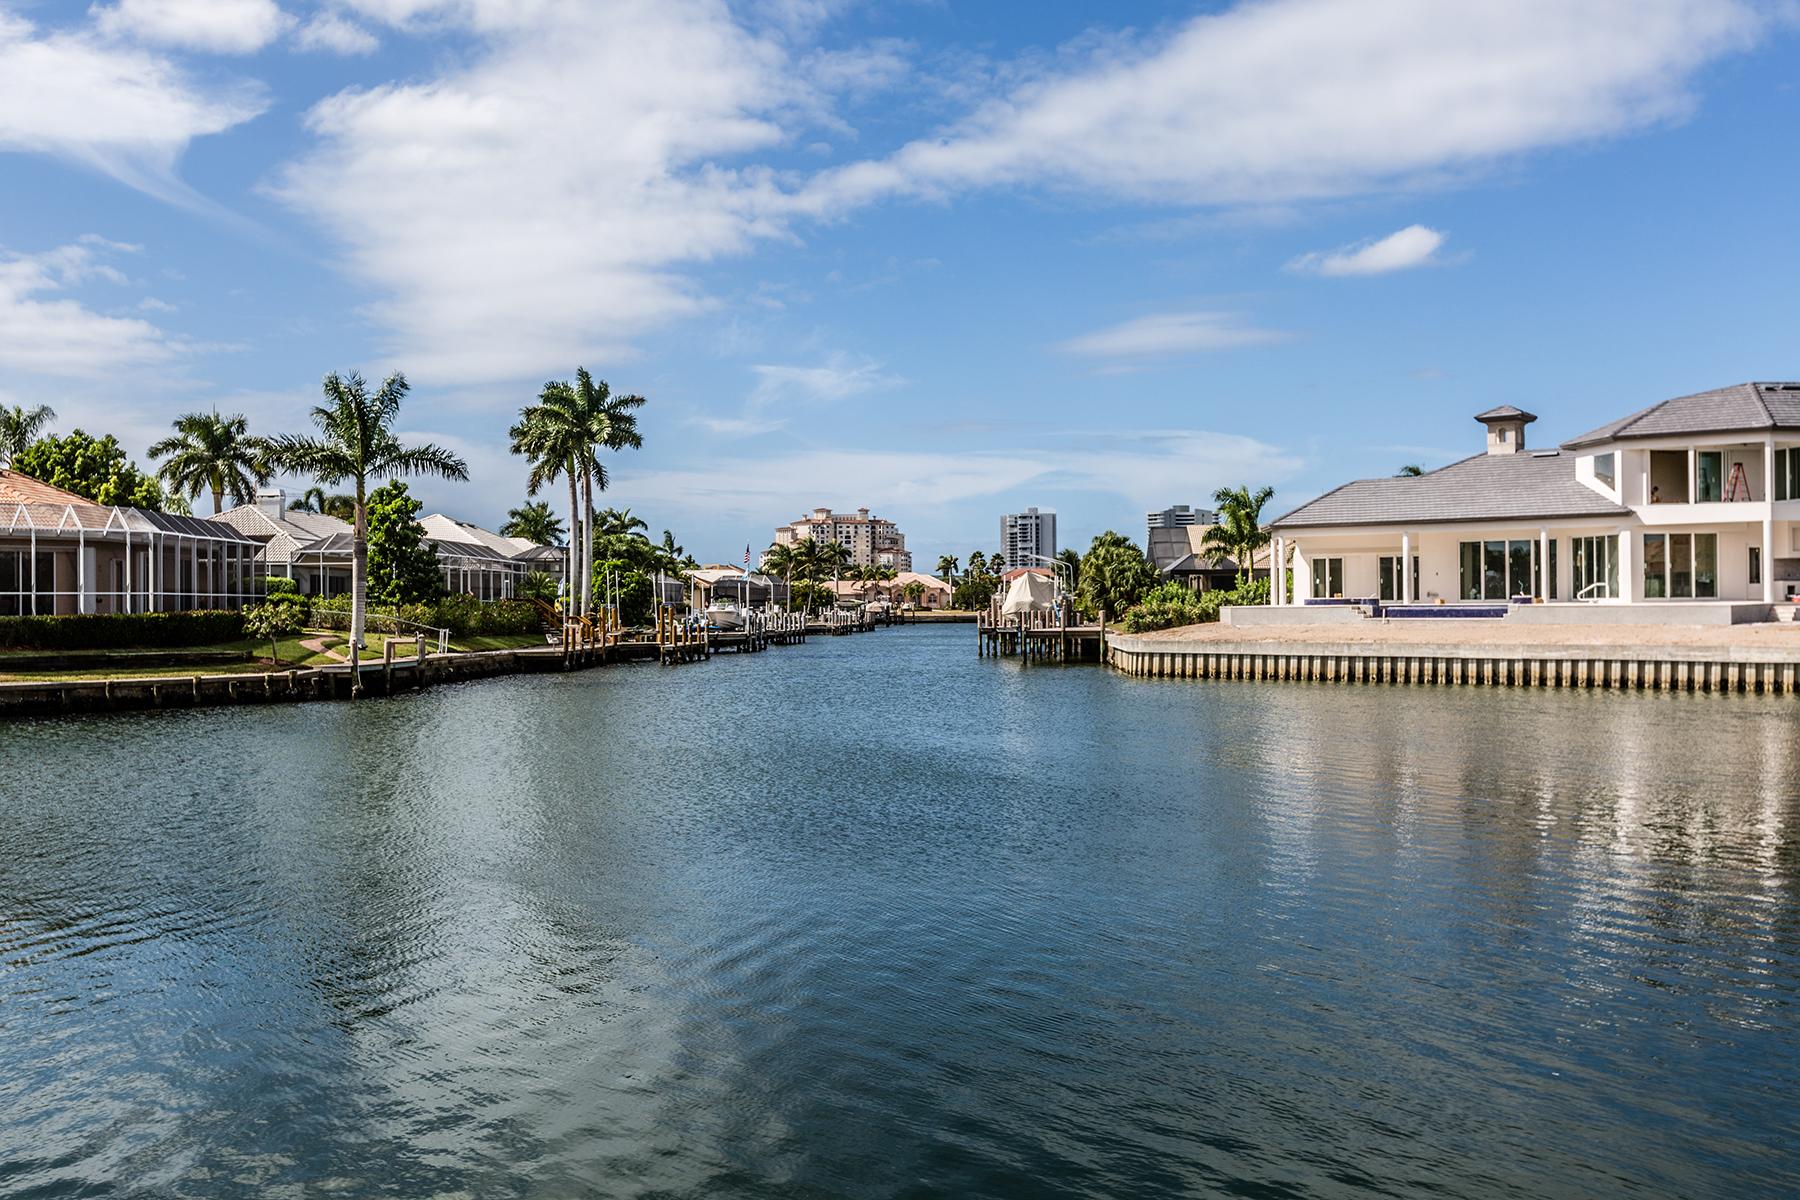 Земля для того Продажа на MARCO ISLAND - WHITEHEART COURT 1153 Whiteheart Ct Marco Island, Флорида, 34145 Соединенные Штаты